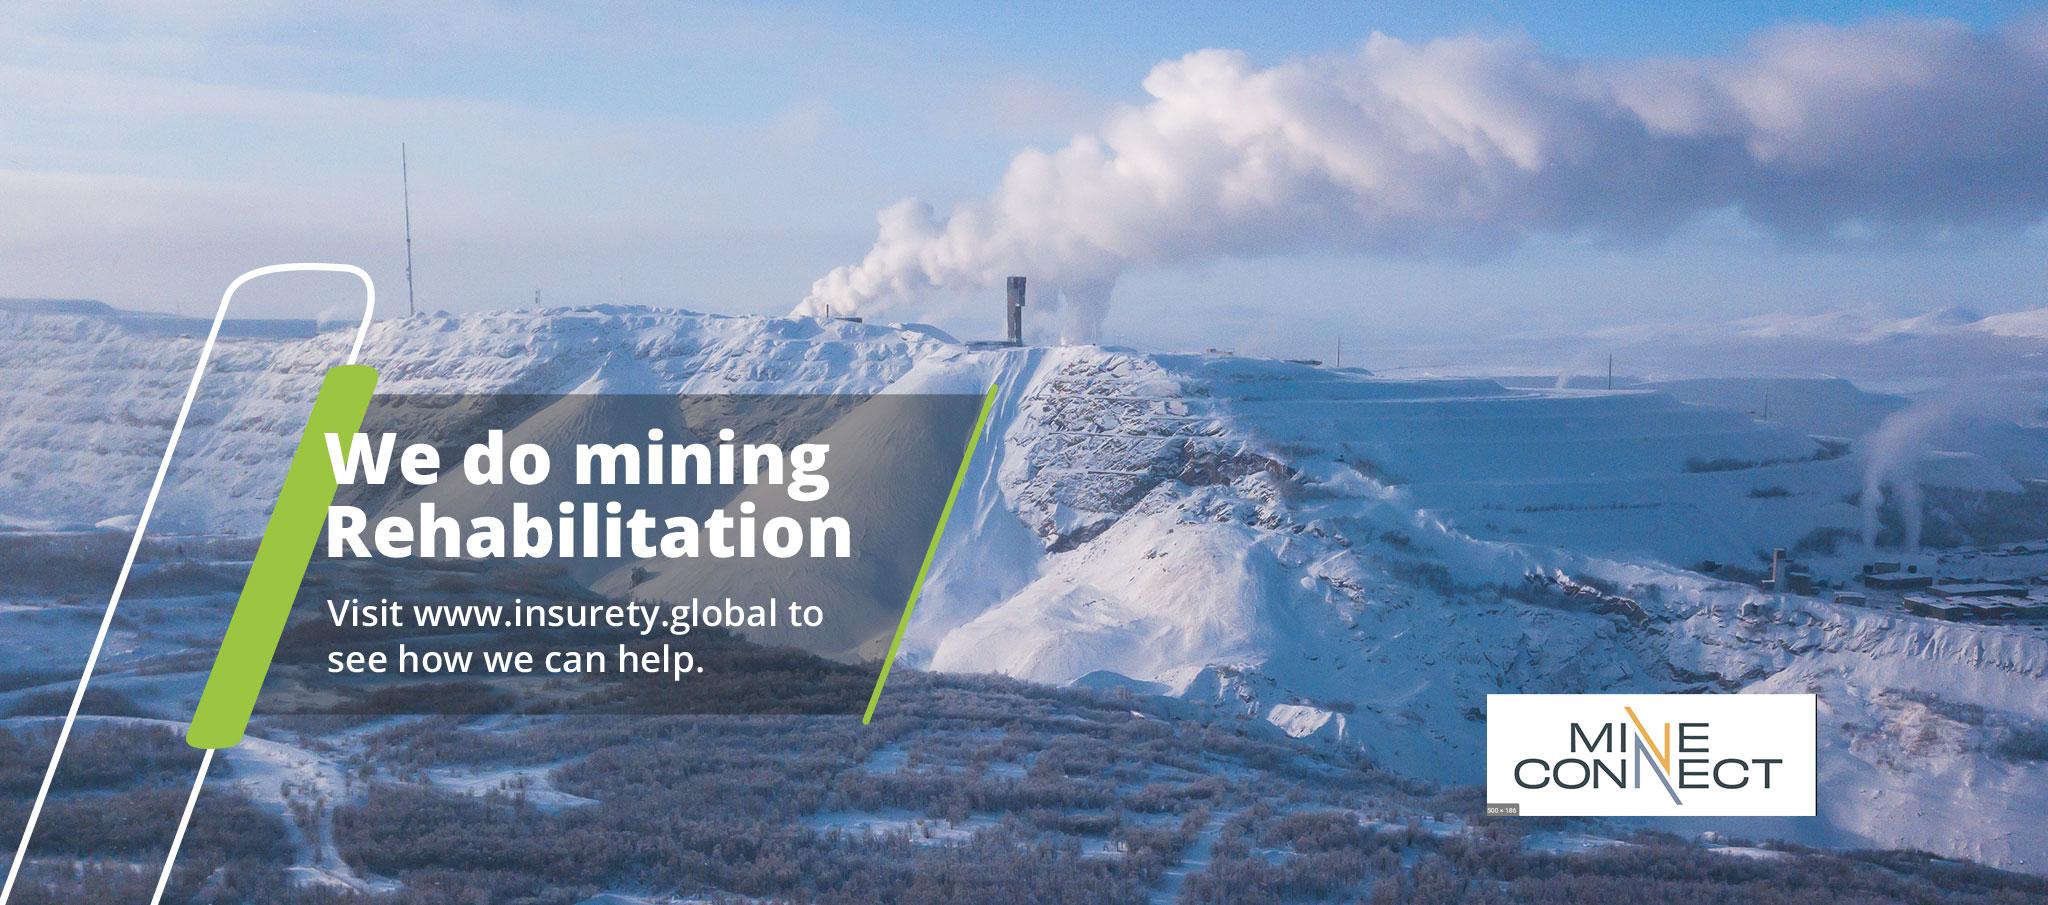 Mining Rehabilitation Insurety